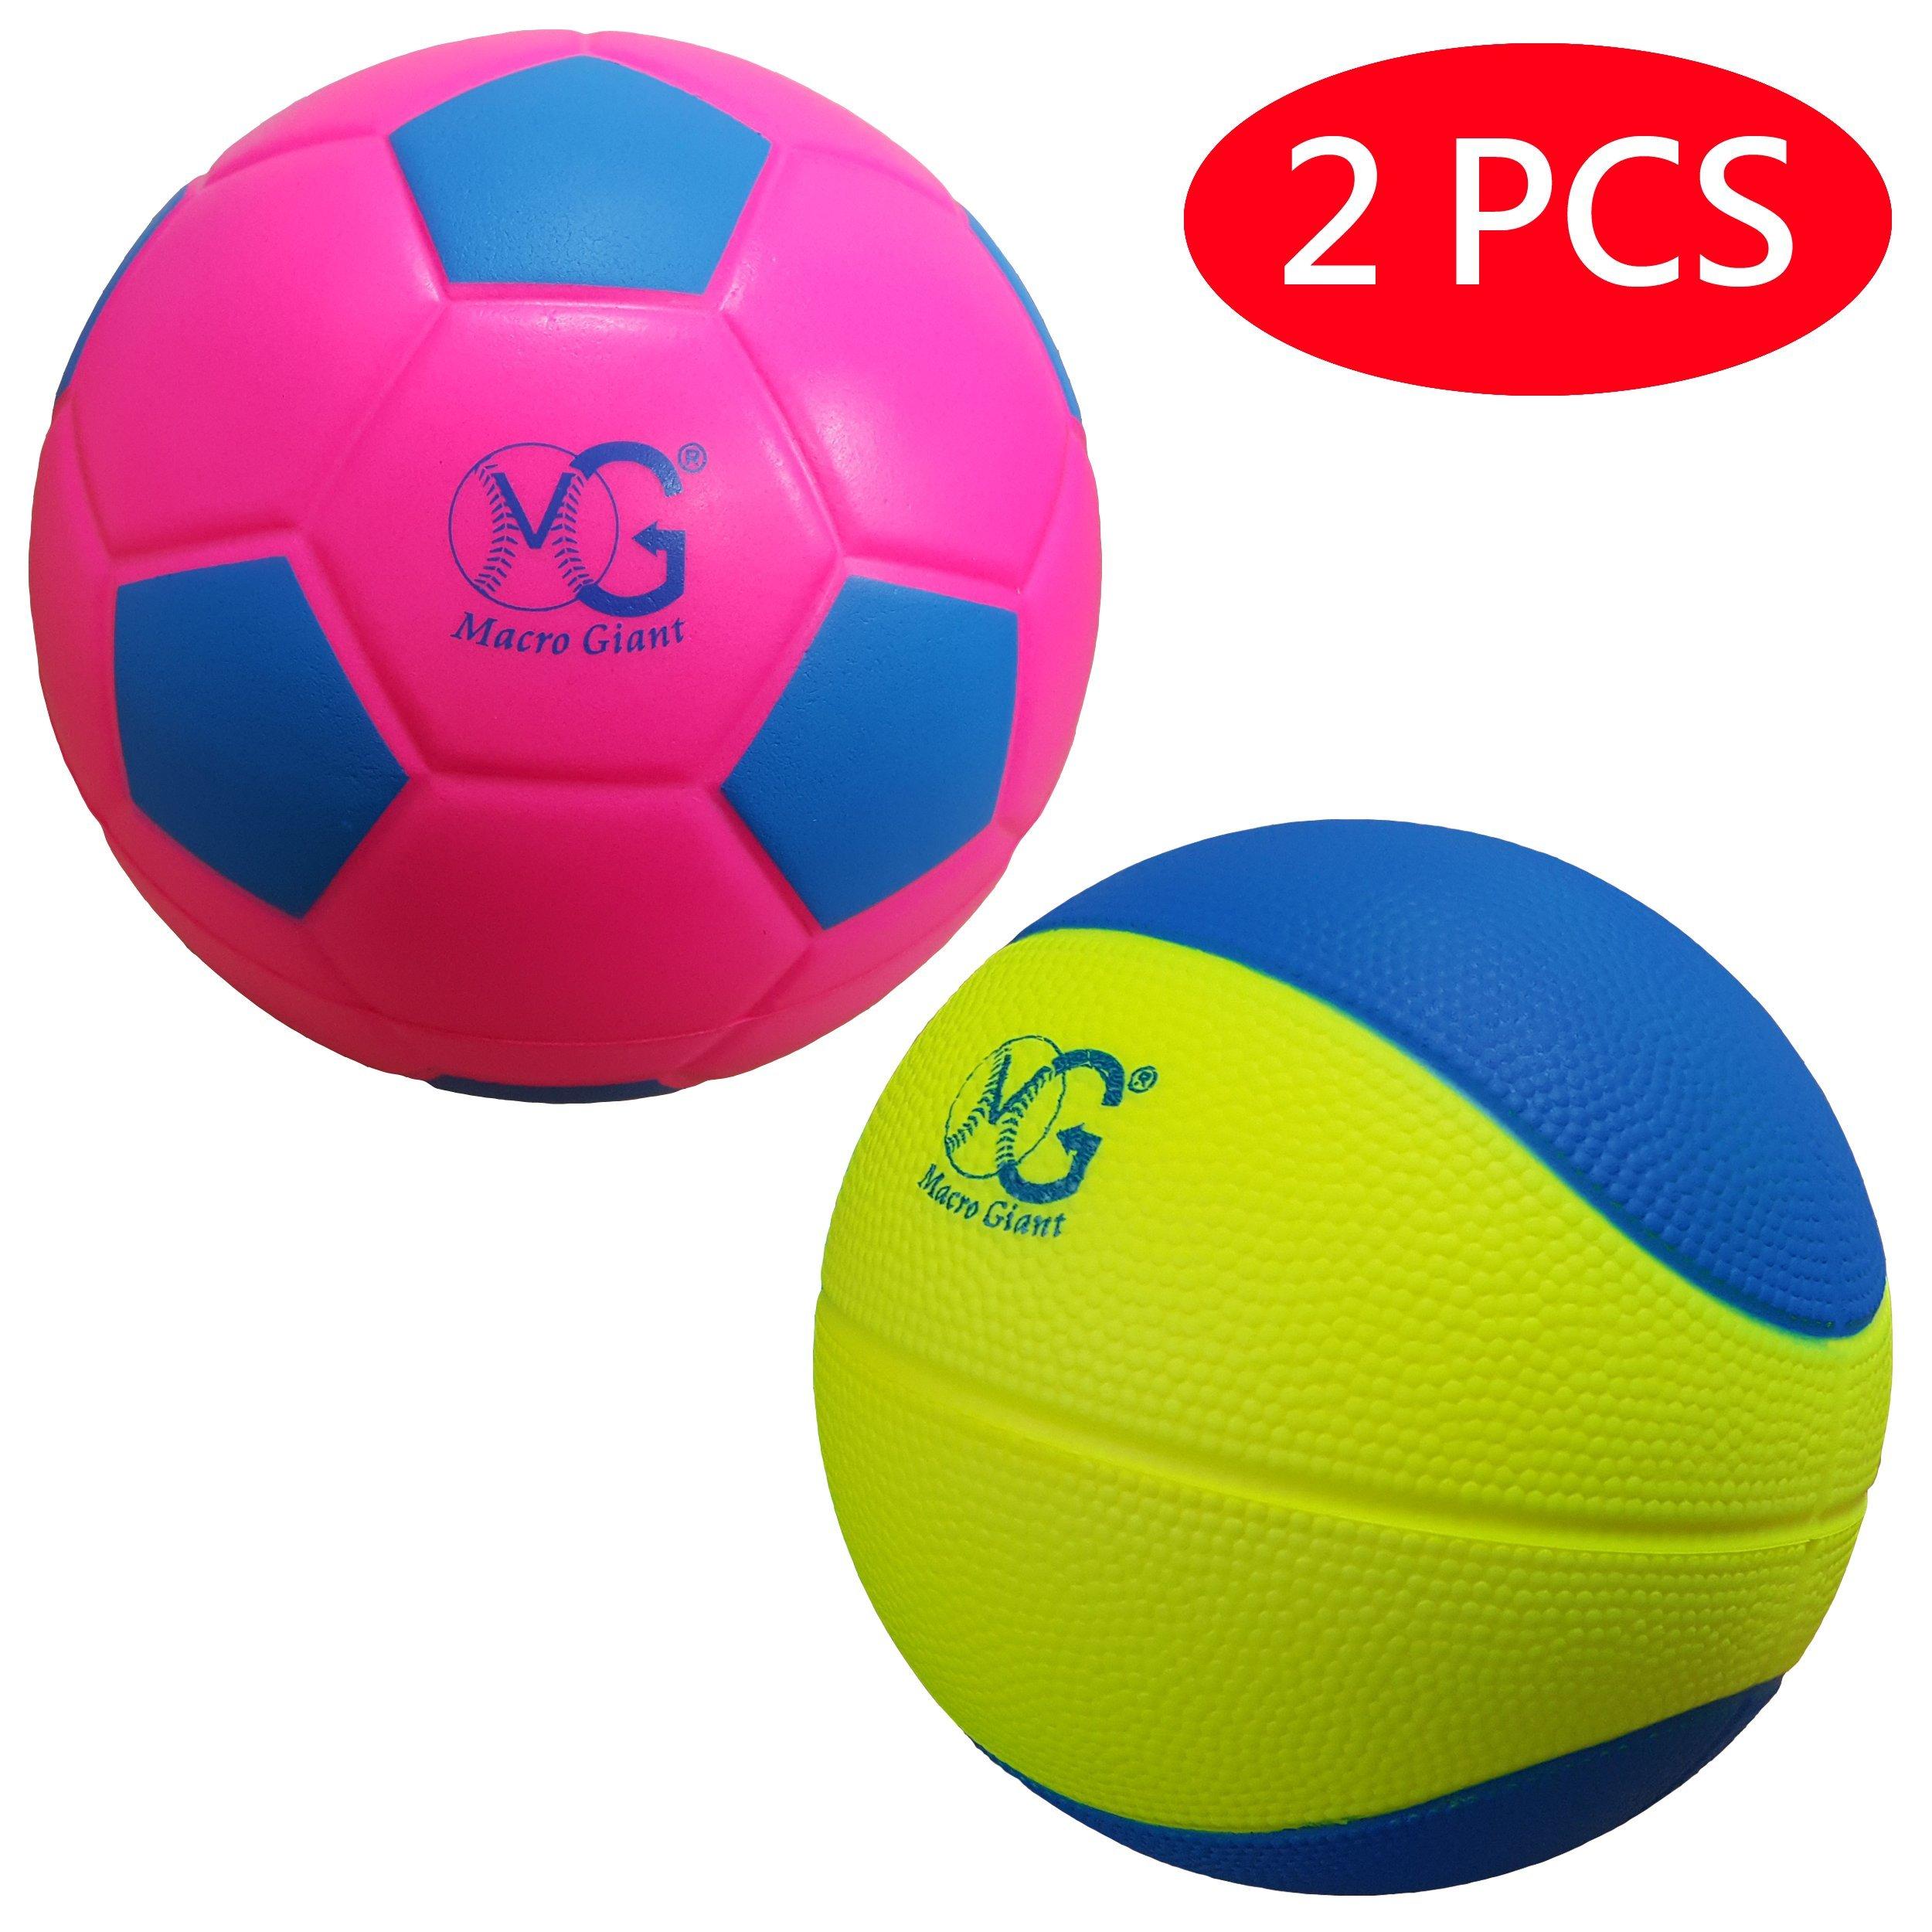 Macro Giant 7.5 Inch (diameter) Foam Basketball-Soccer Pack, Set of 1 Soccer & 1 Basketball, Neon Colors, Kid Sports Toys, Kickball, Playground ball,Kid Toy ,Birthday Gift